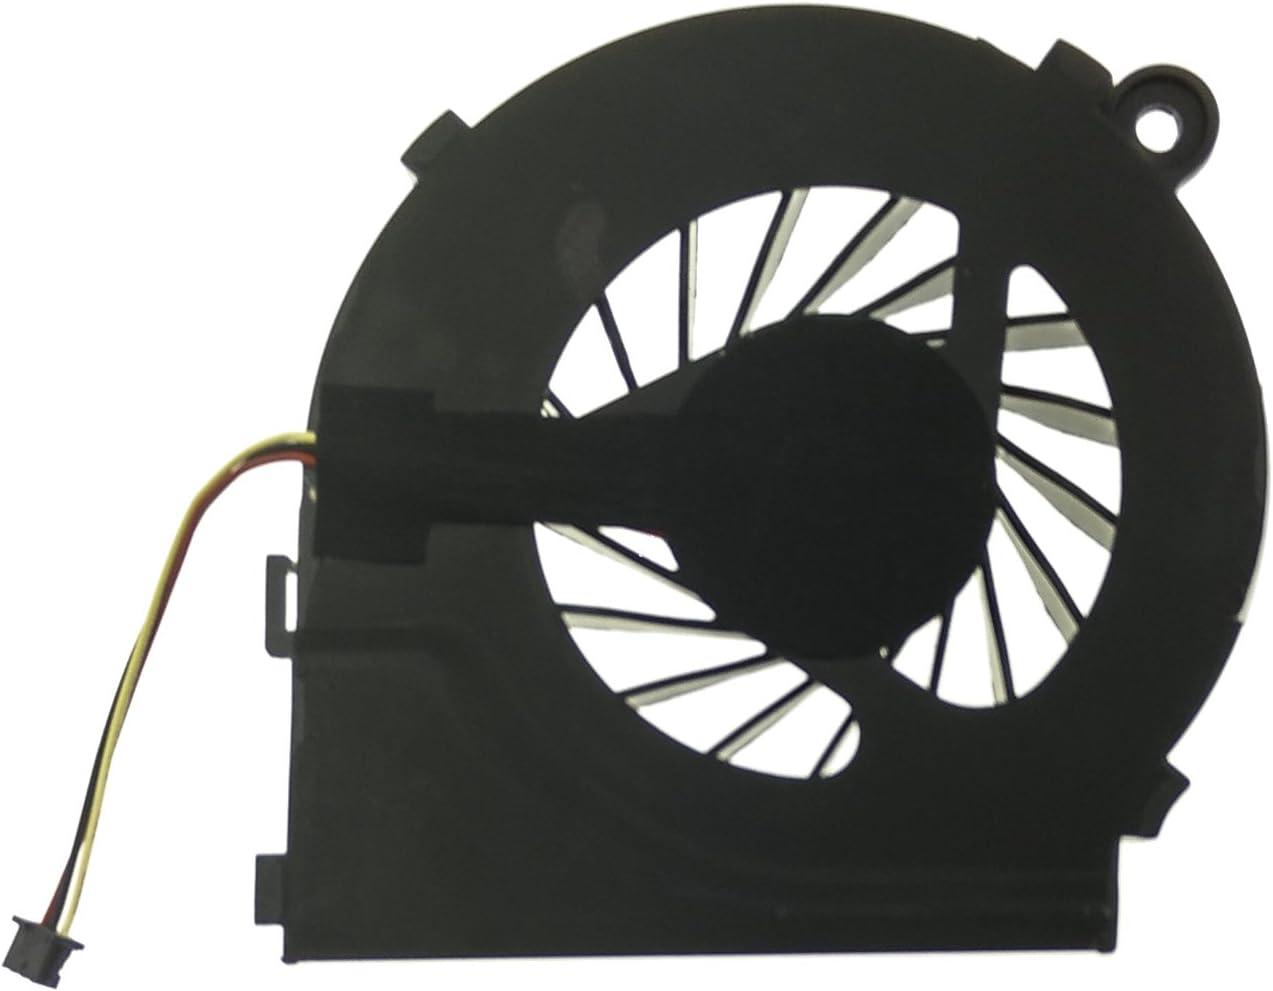 Ventilador HP - 646577-001 compatible con HP-Compaq G G6-1000 | G6 ...